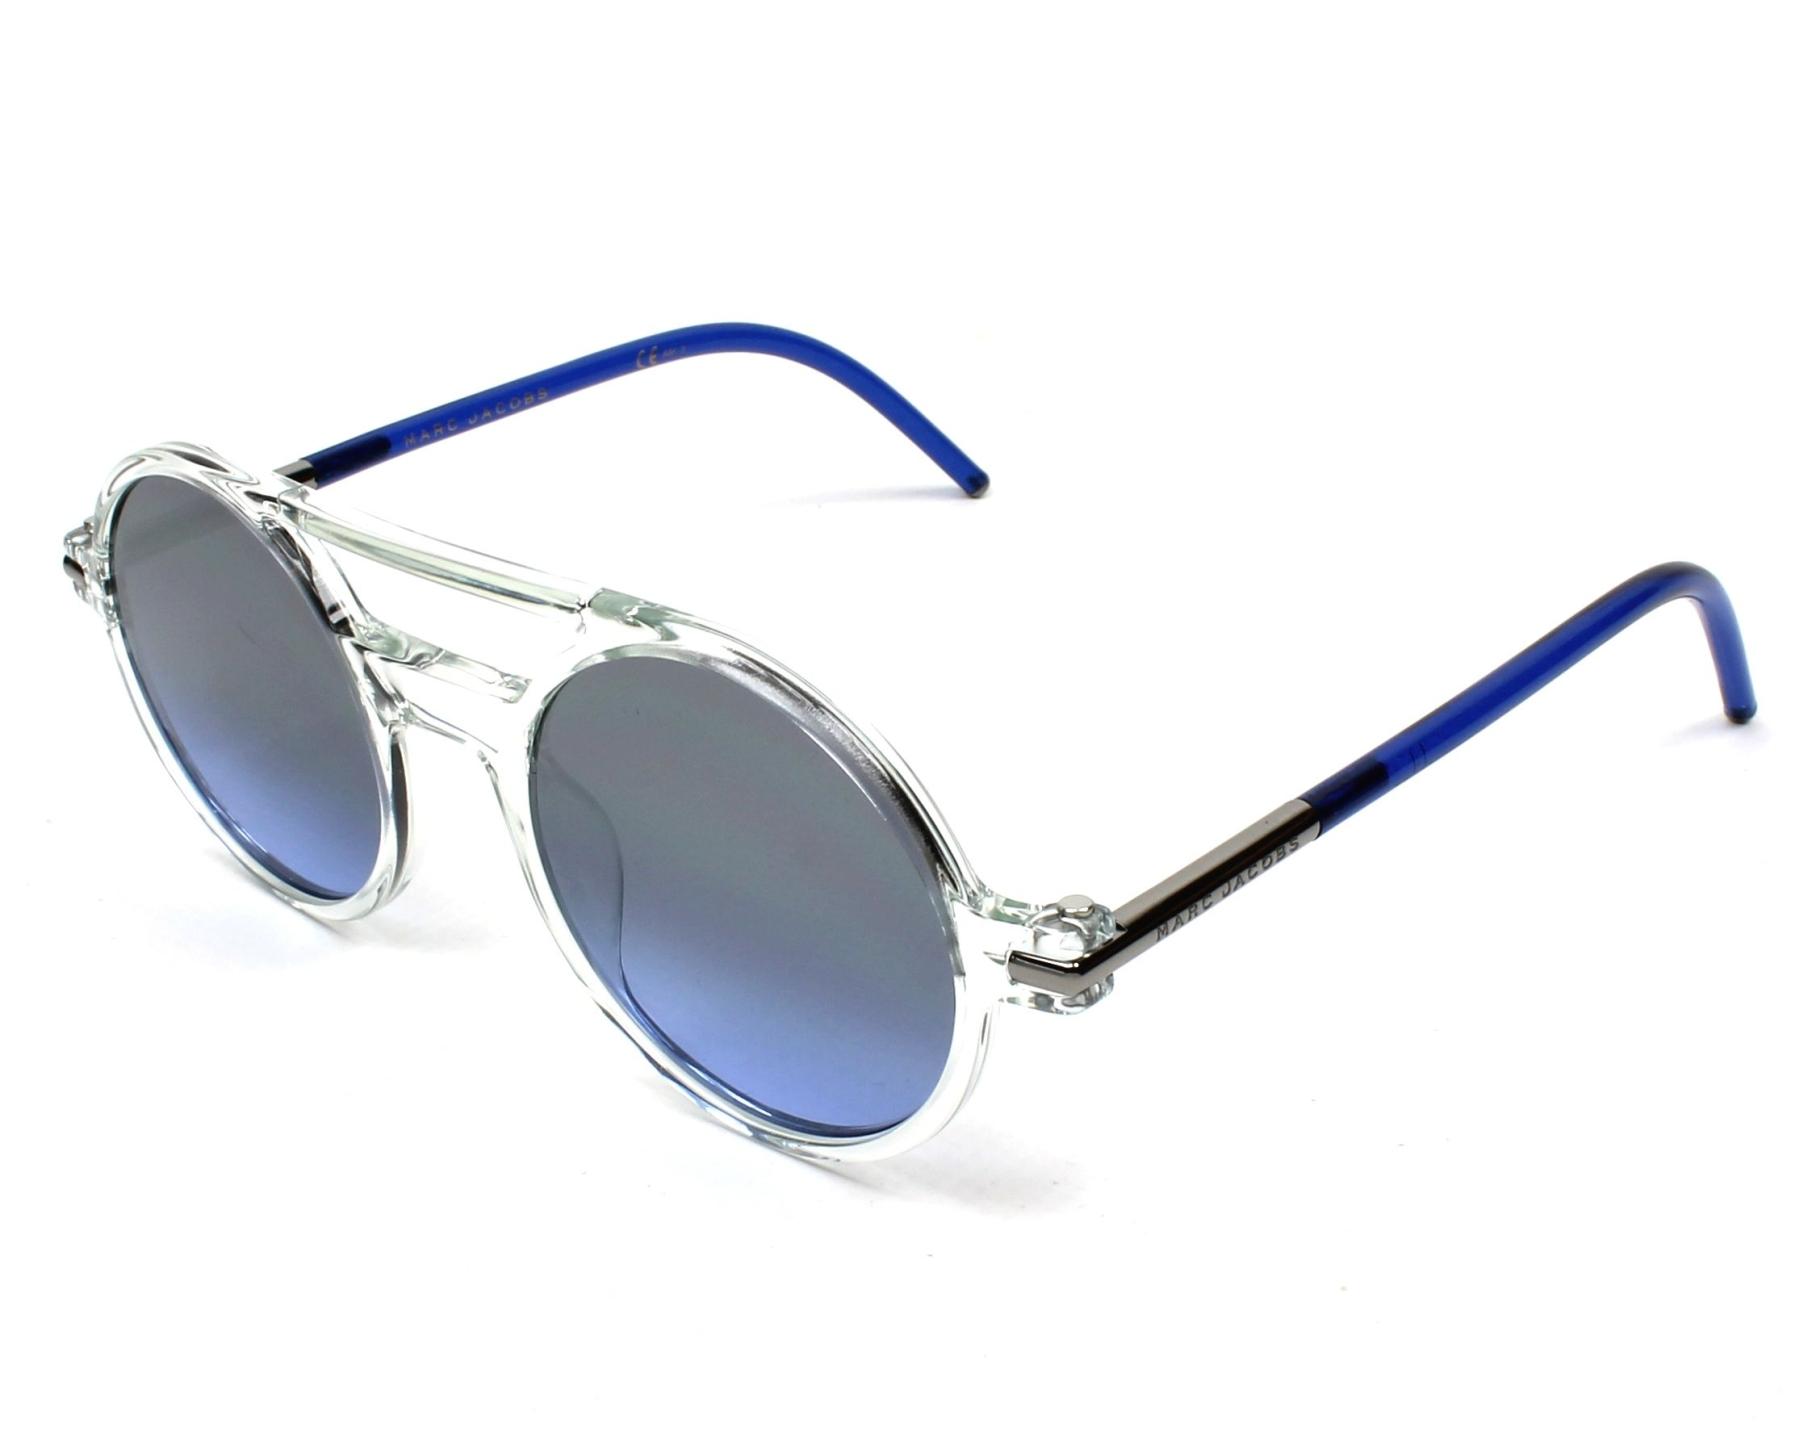 745ffb757c Sunglasses Marc Jacobs MARC-45-S TMD I5 48-21 Crystal Blue